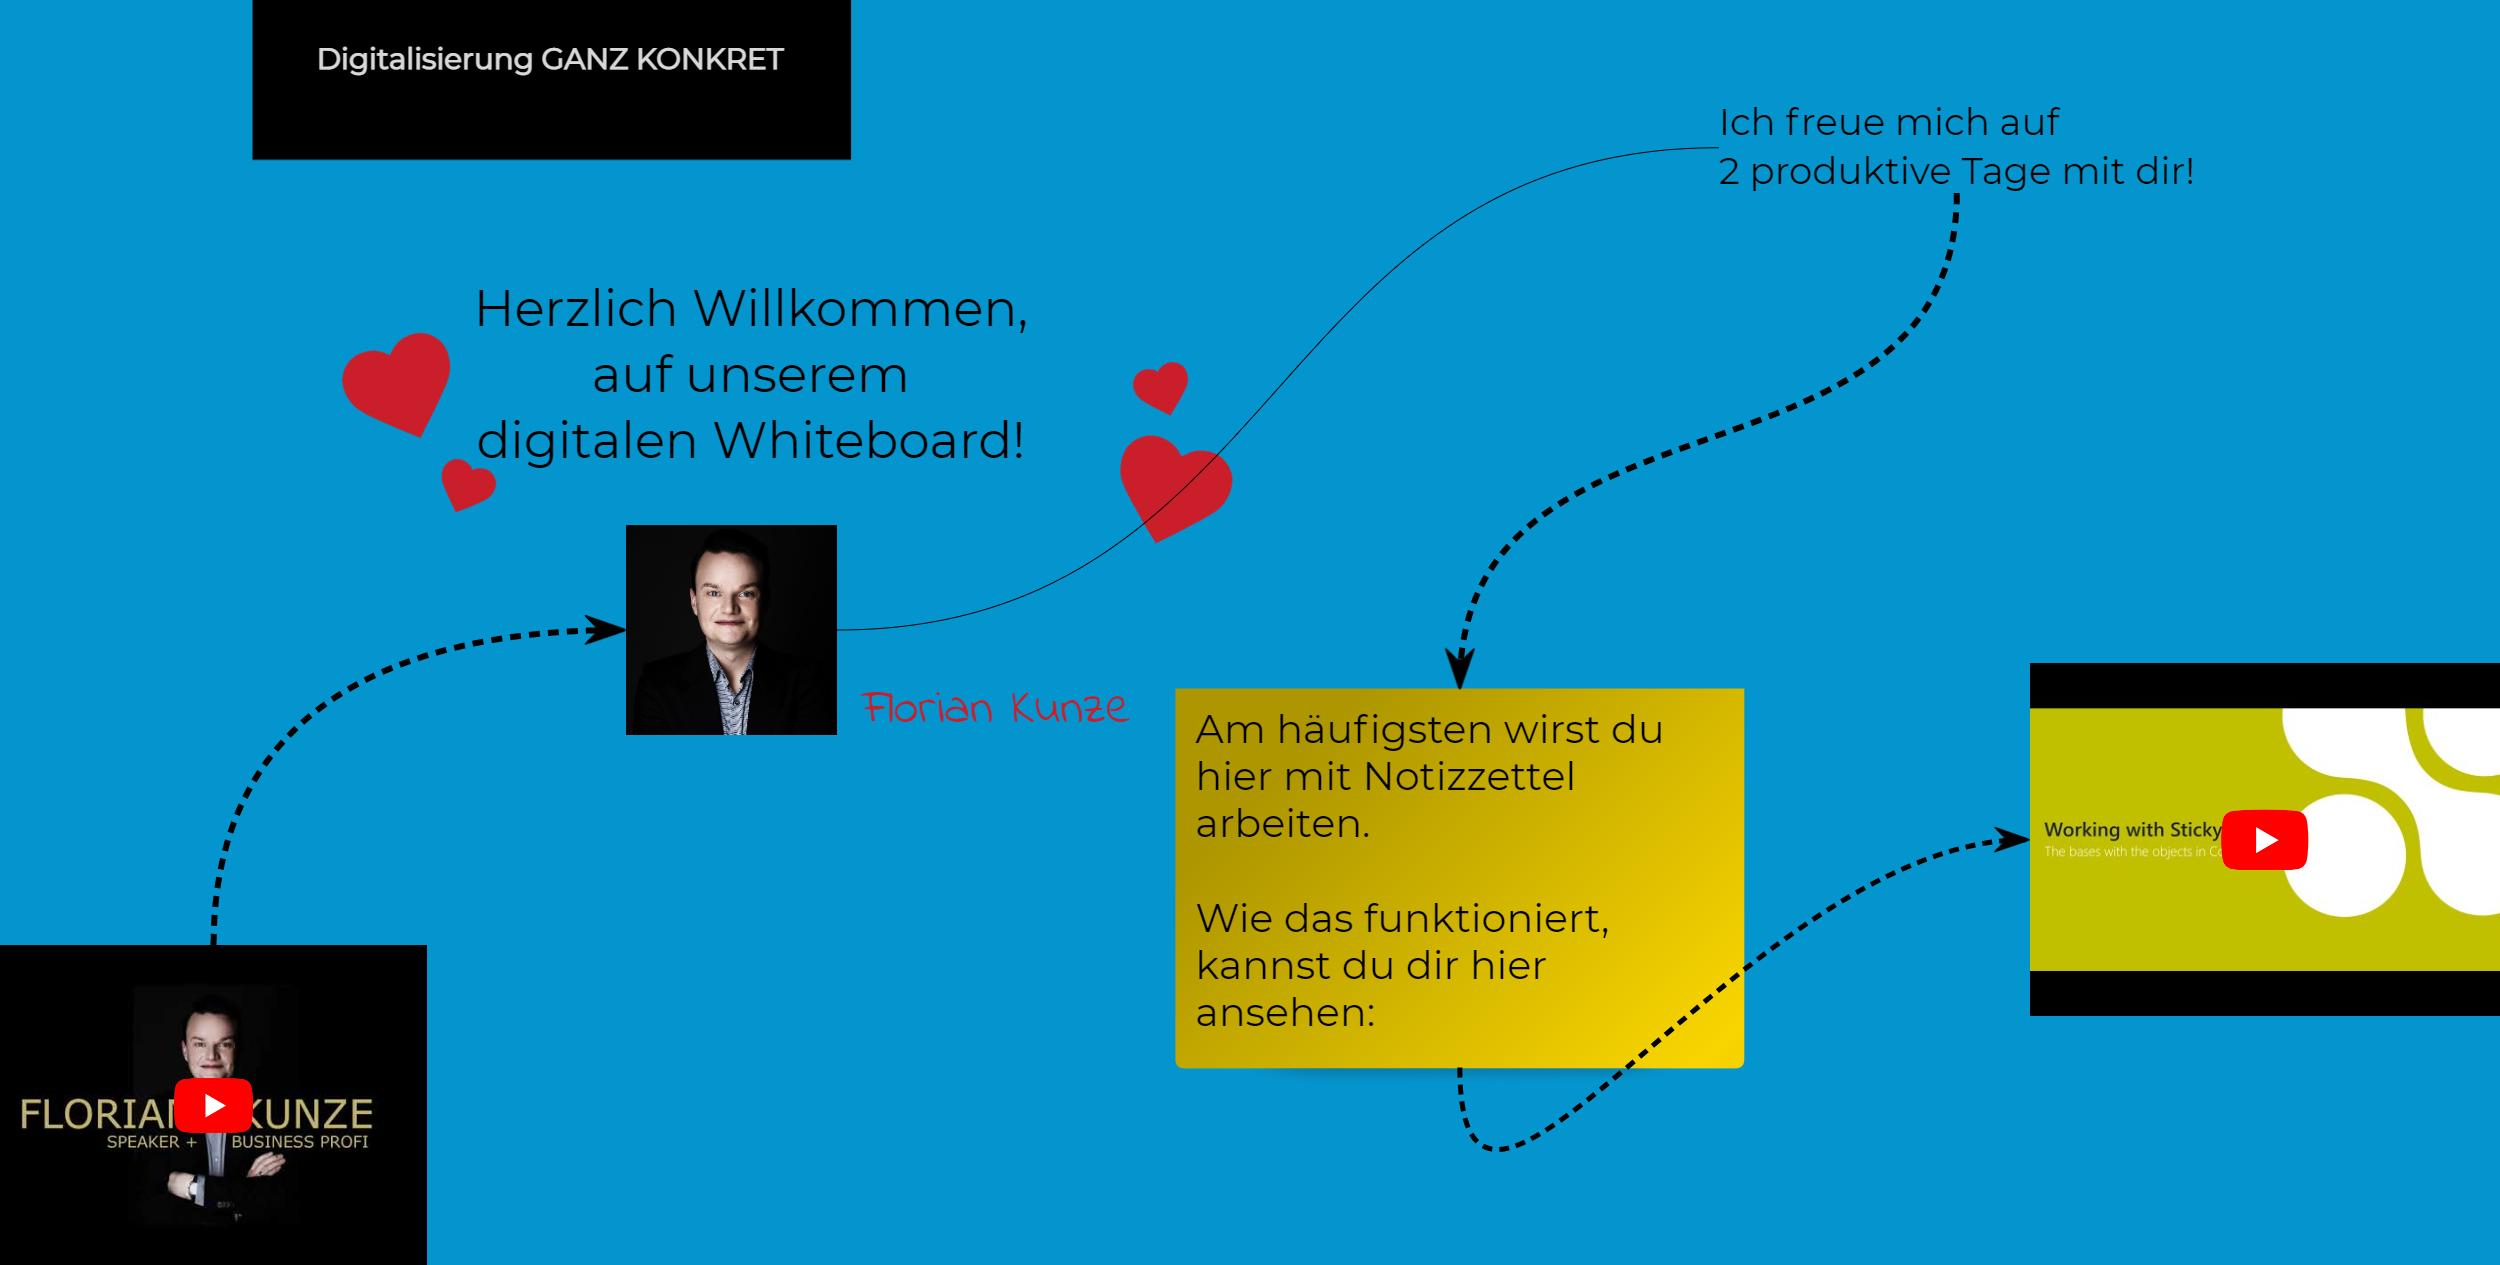 Gruppenboard - Digitalisierung GANZ KONKRET (1)